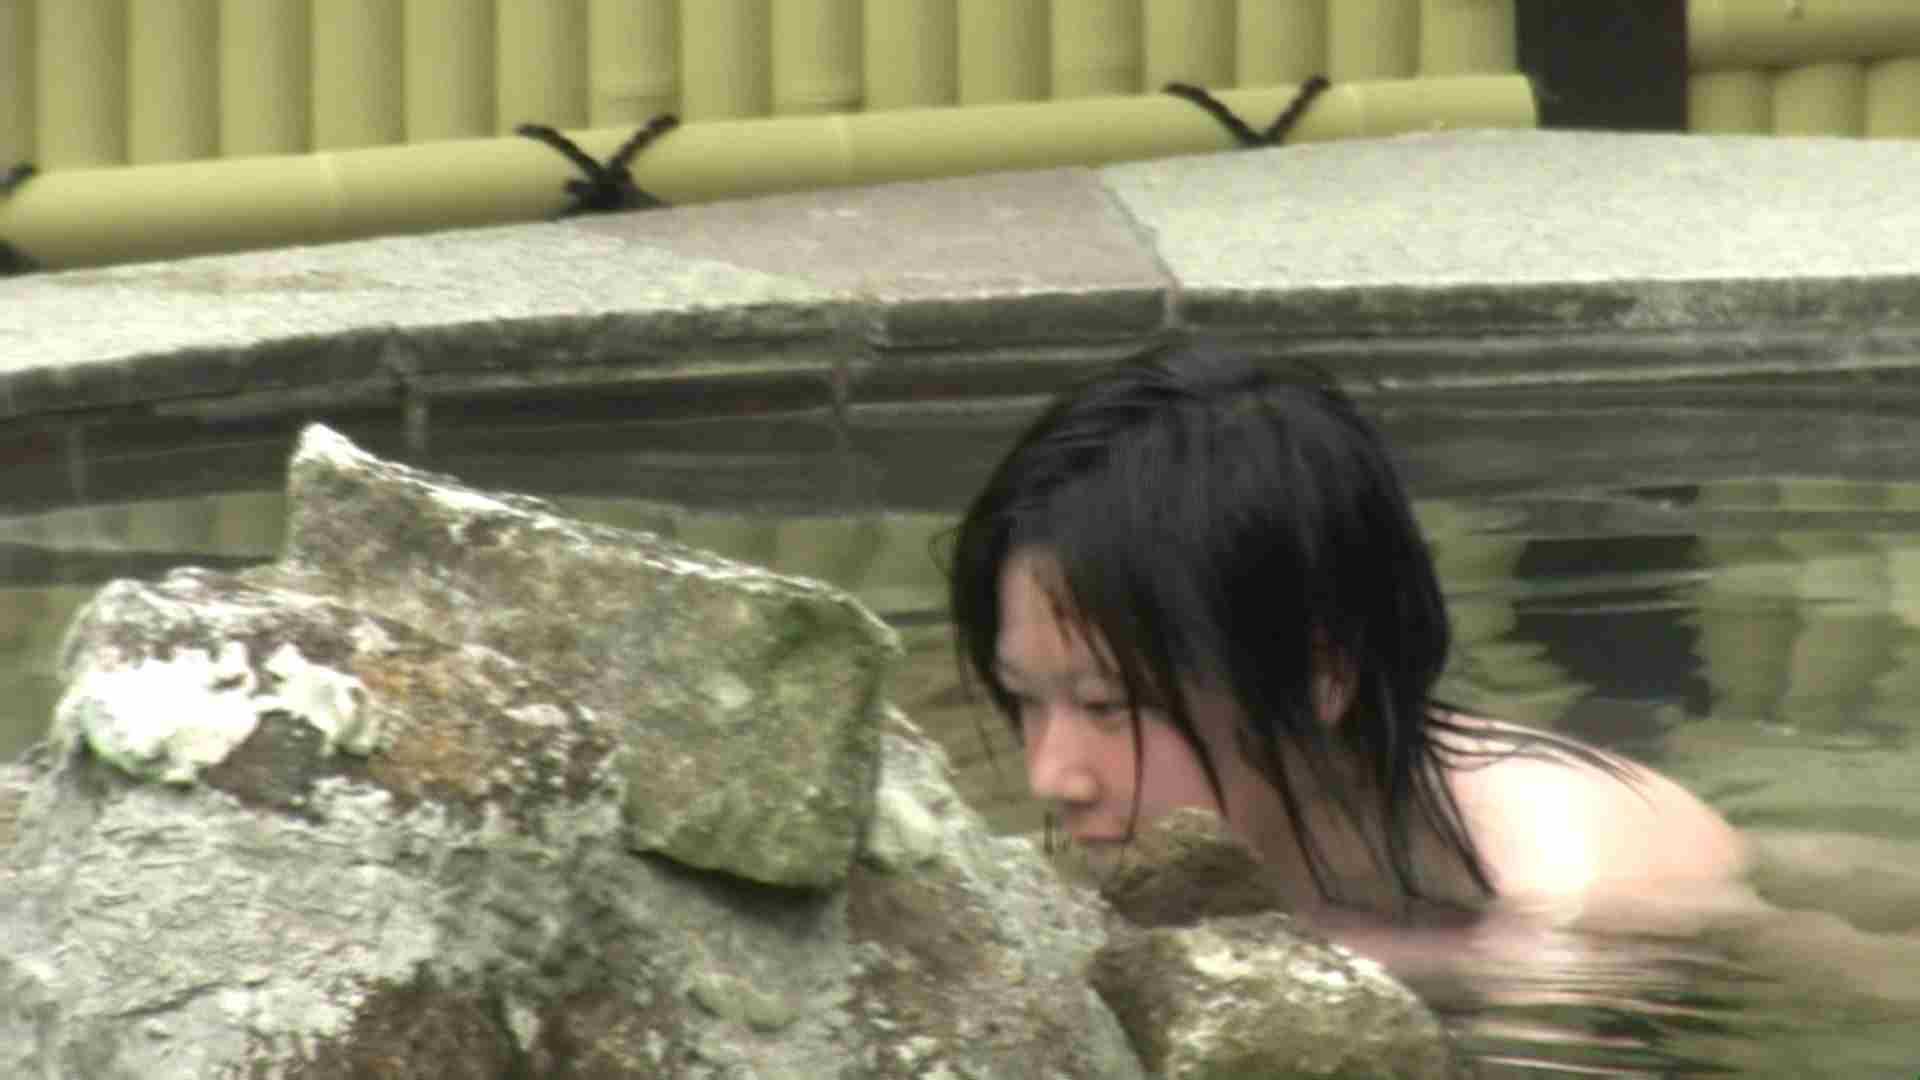 Aquaな露天風呂Vol.36 盗撮 | HなOL  68pic 68